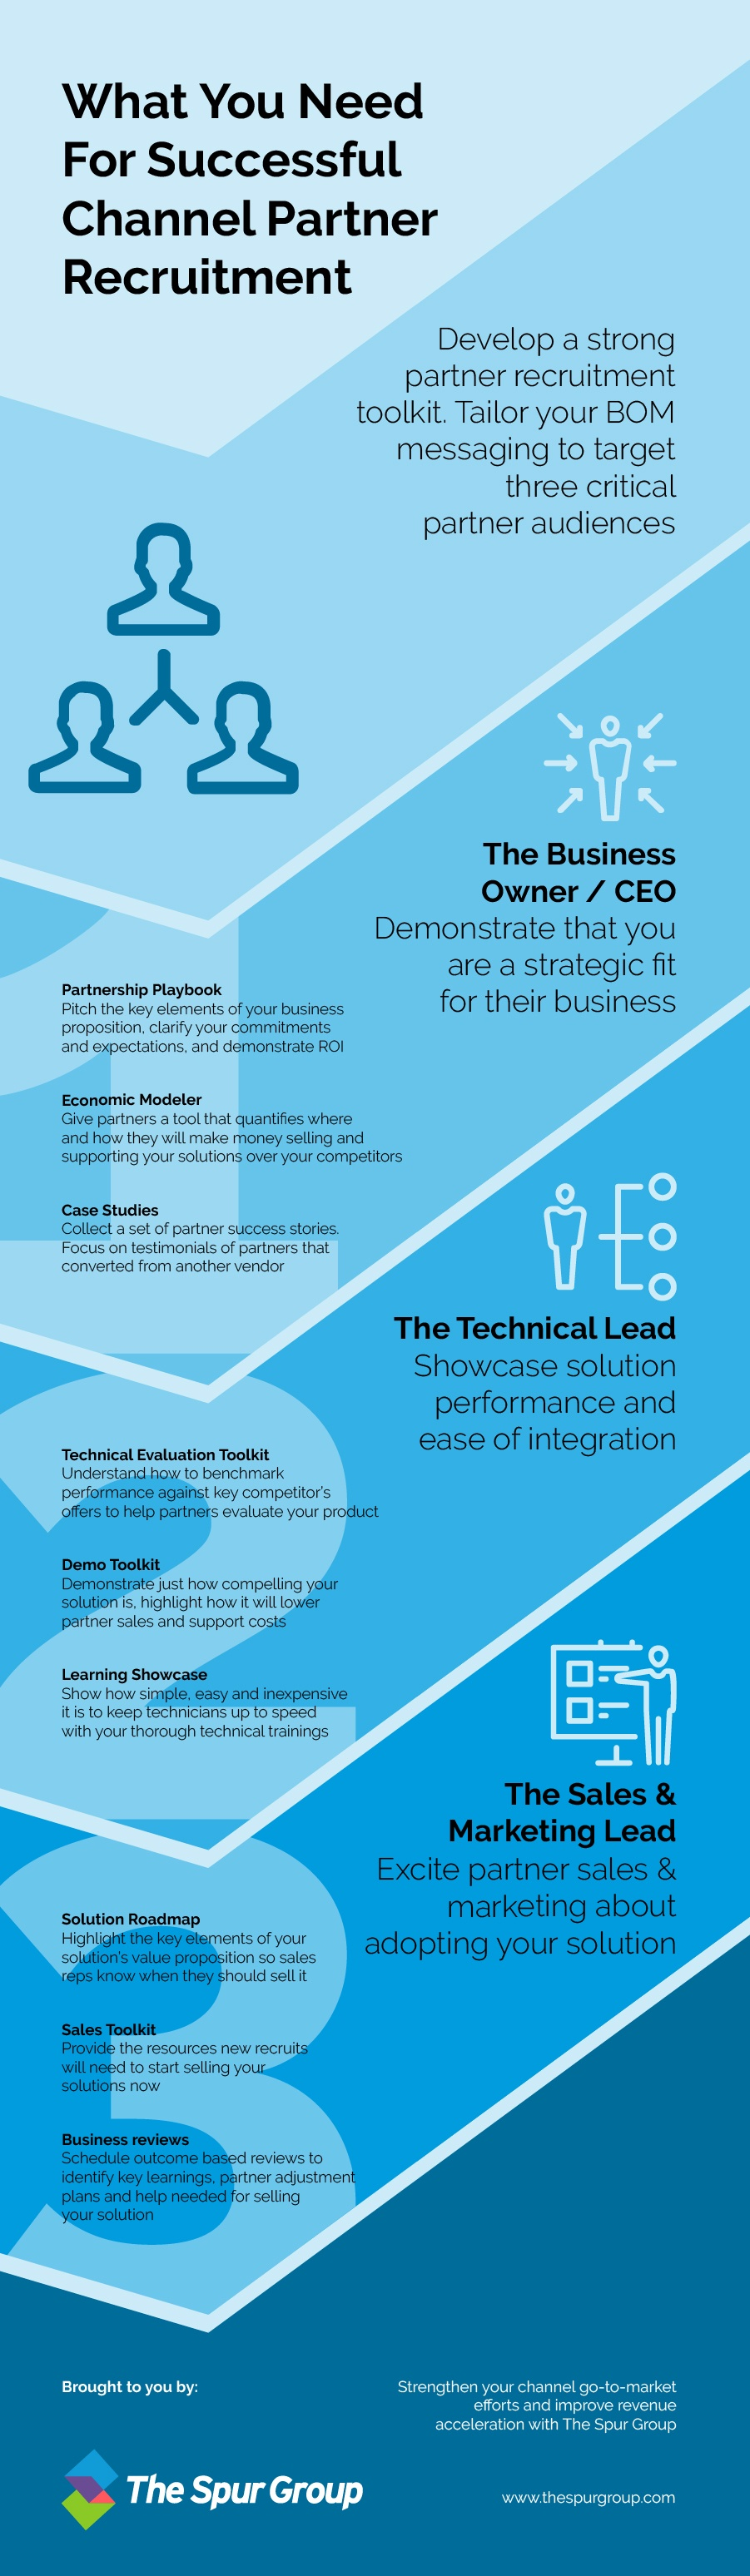 Channel Partner Recruitment BOM Infographic